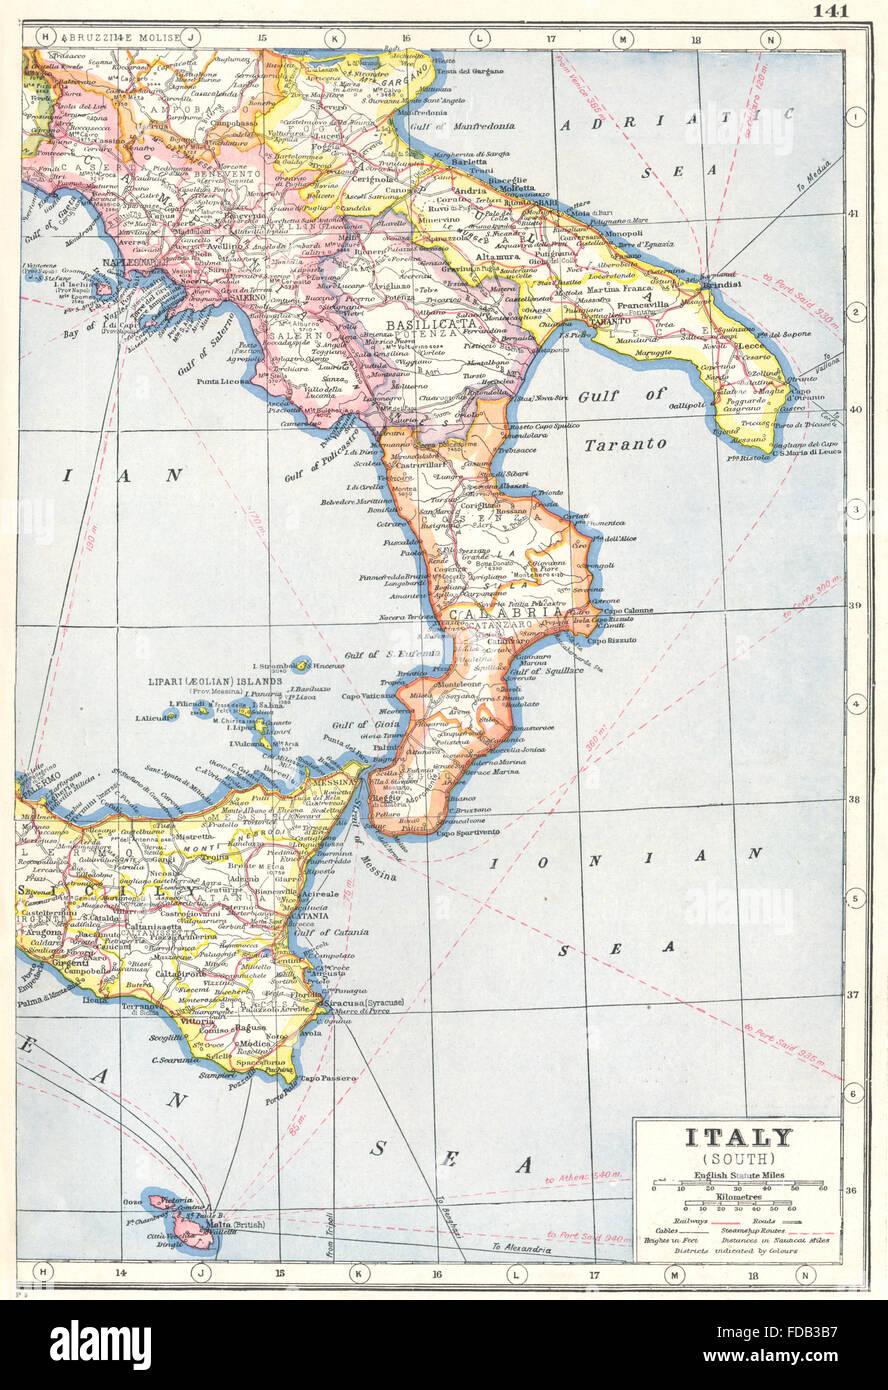 Cartina Calabria E Basilicata.Italia Del Sud Malta Sicilia Calabria Basilicata Puglia